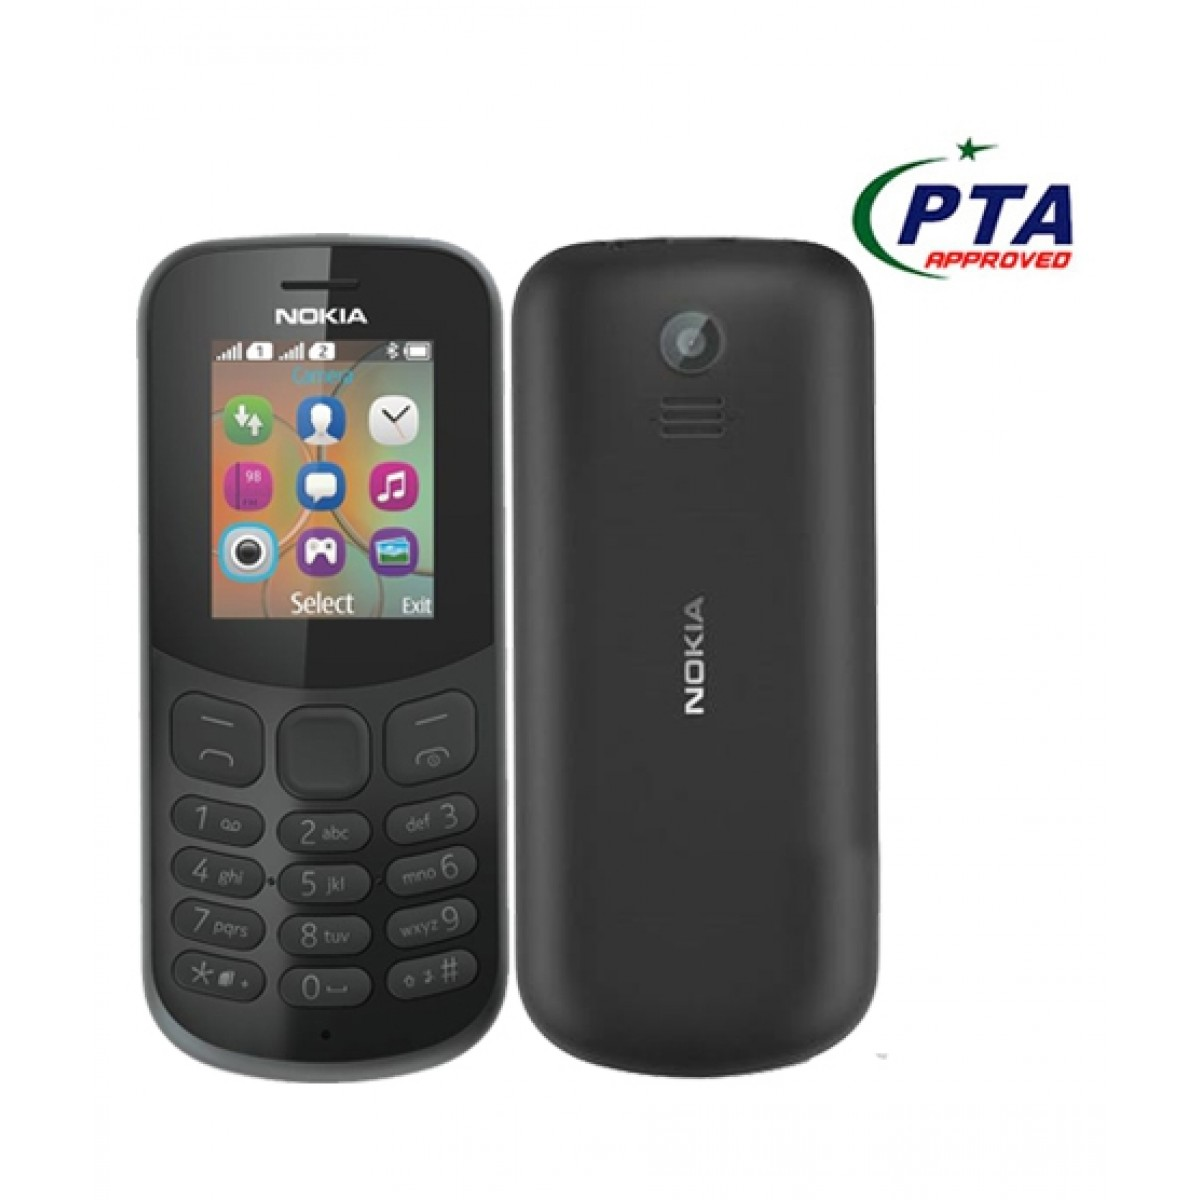 eb2c9fbd7265e Nokia 130 2017 Price in Pakistan | Buy Nokia 130 2017 Dual Sim Black -  Official Warranty | iShopping.pk